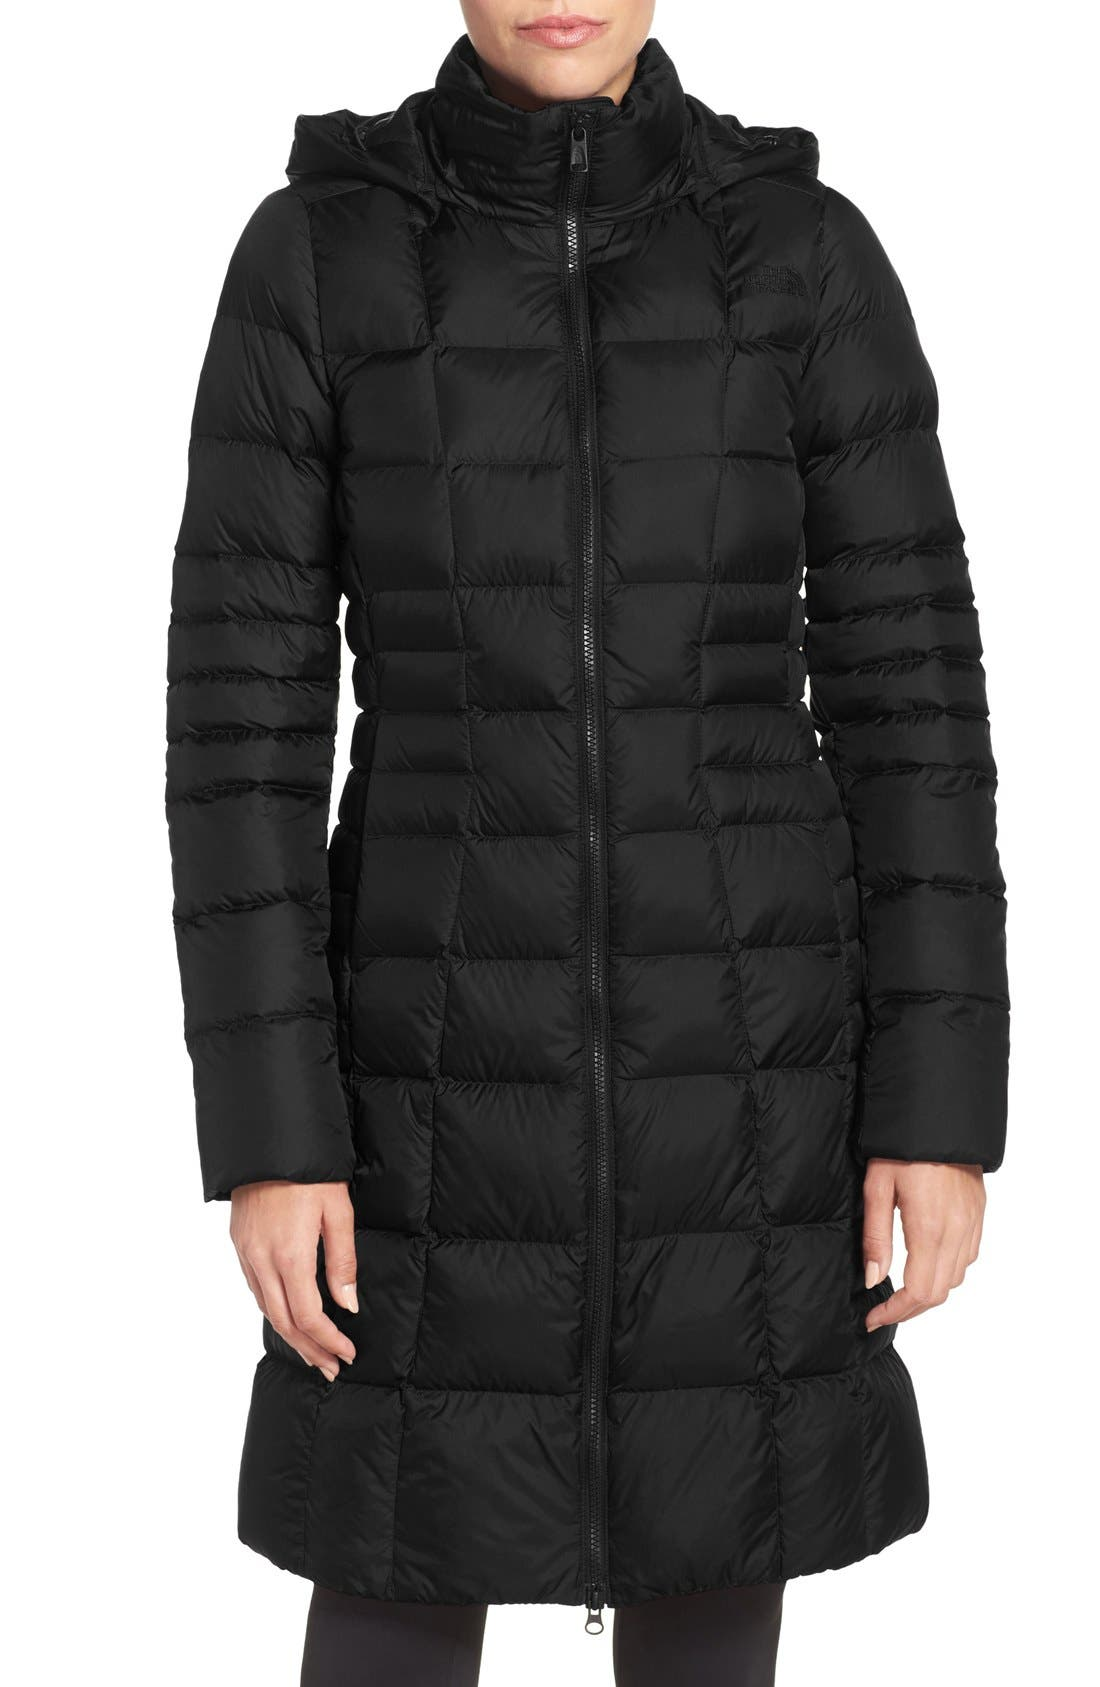 north face puffer coat womens 2017